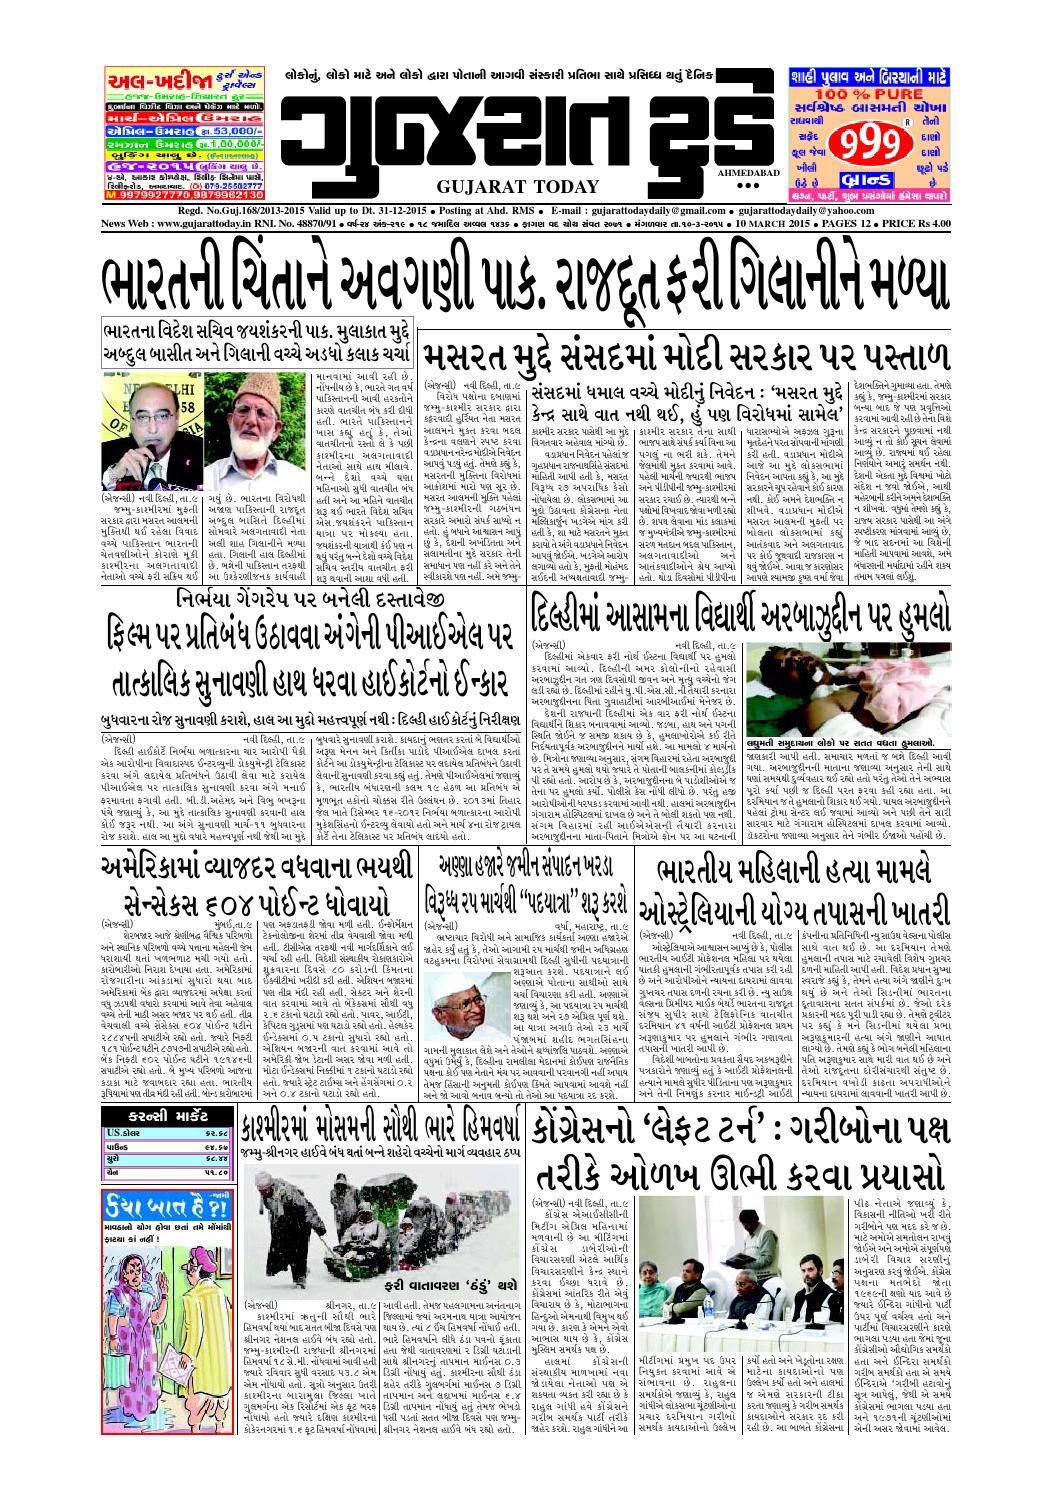 Gujarat Today